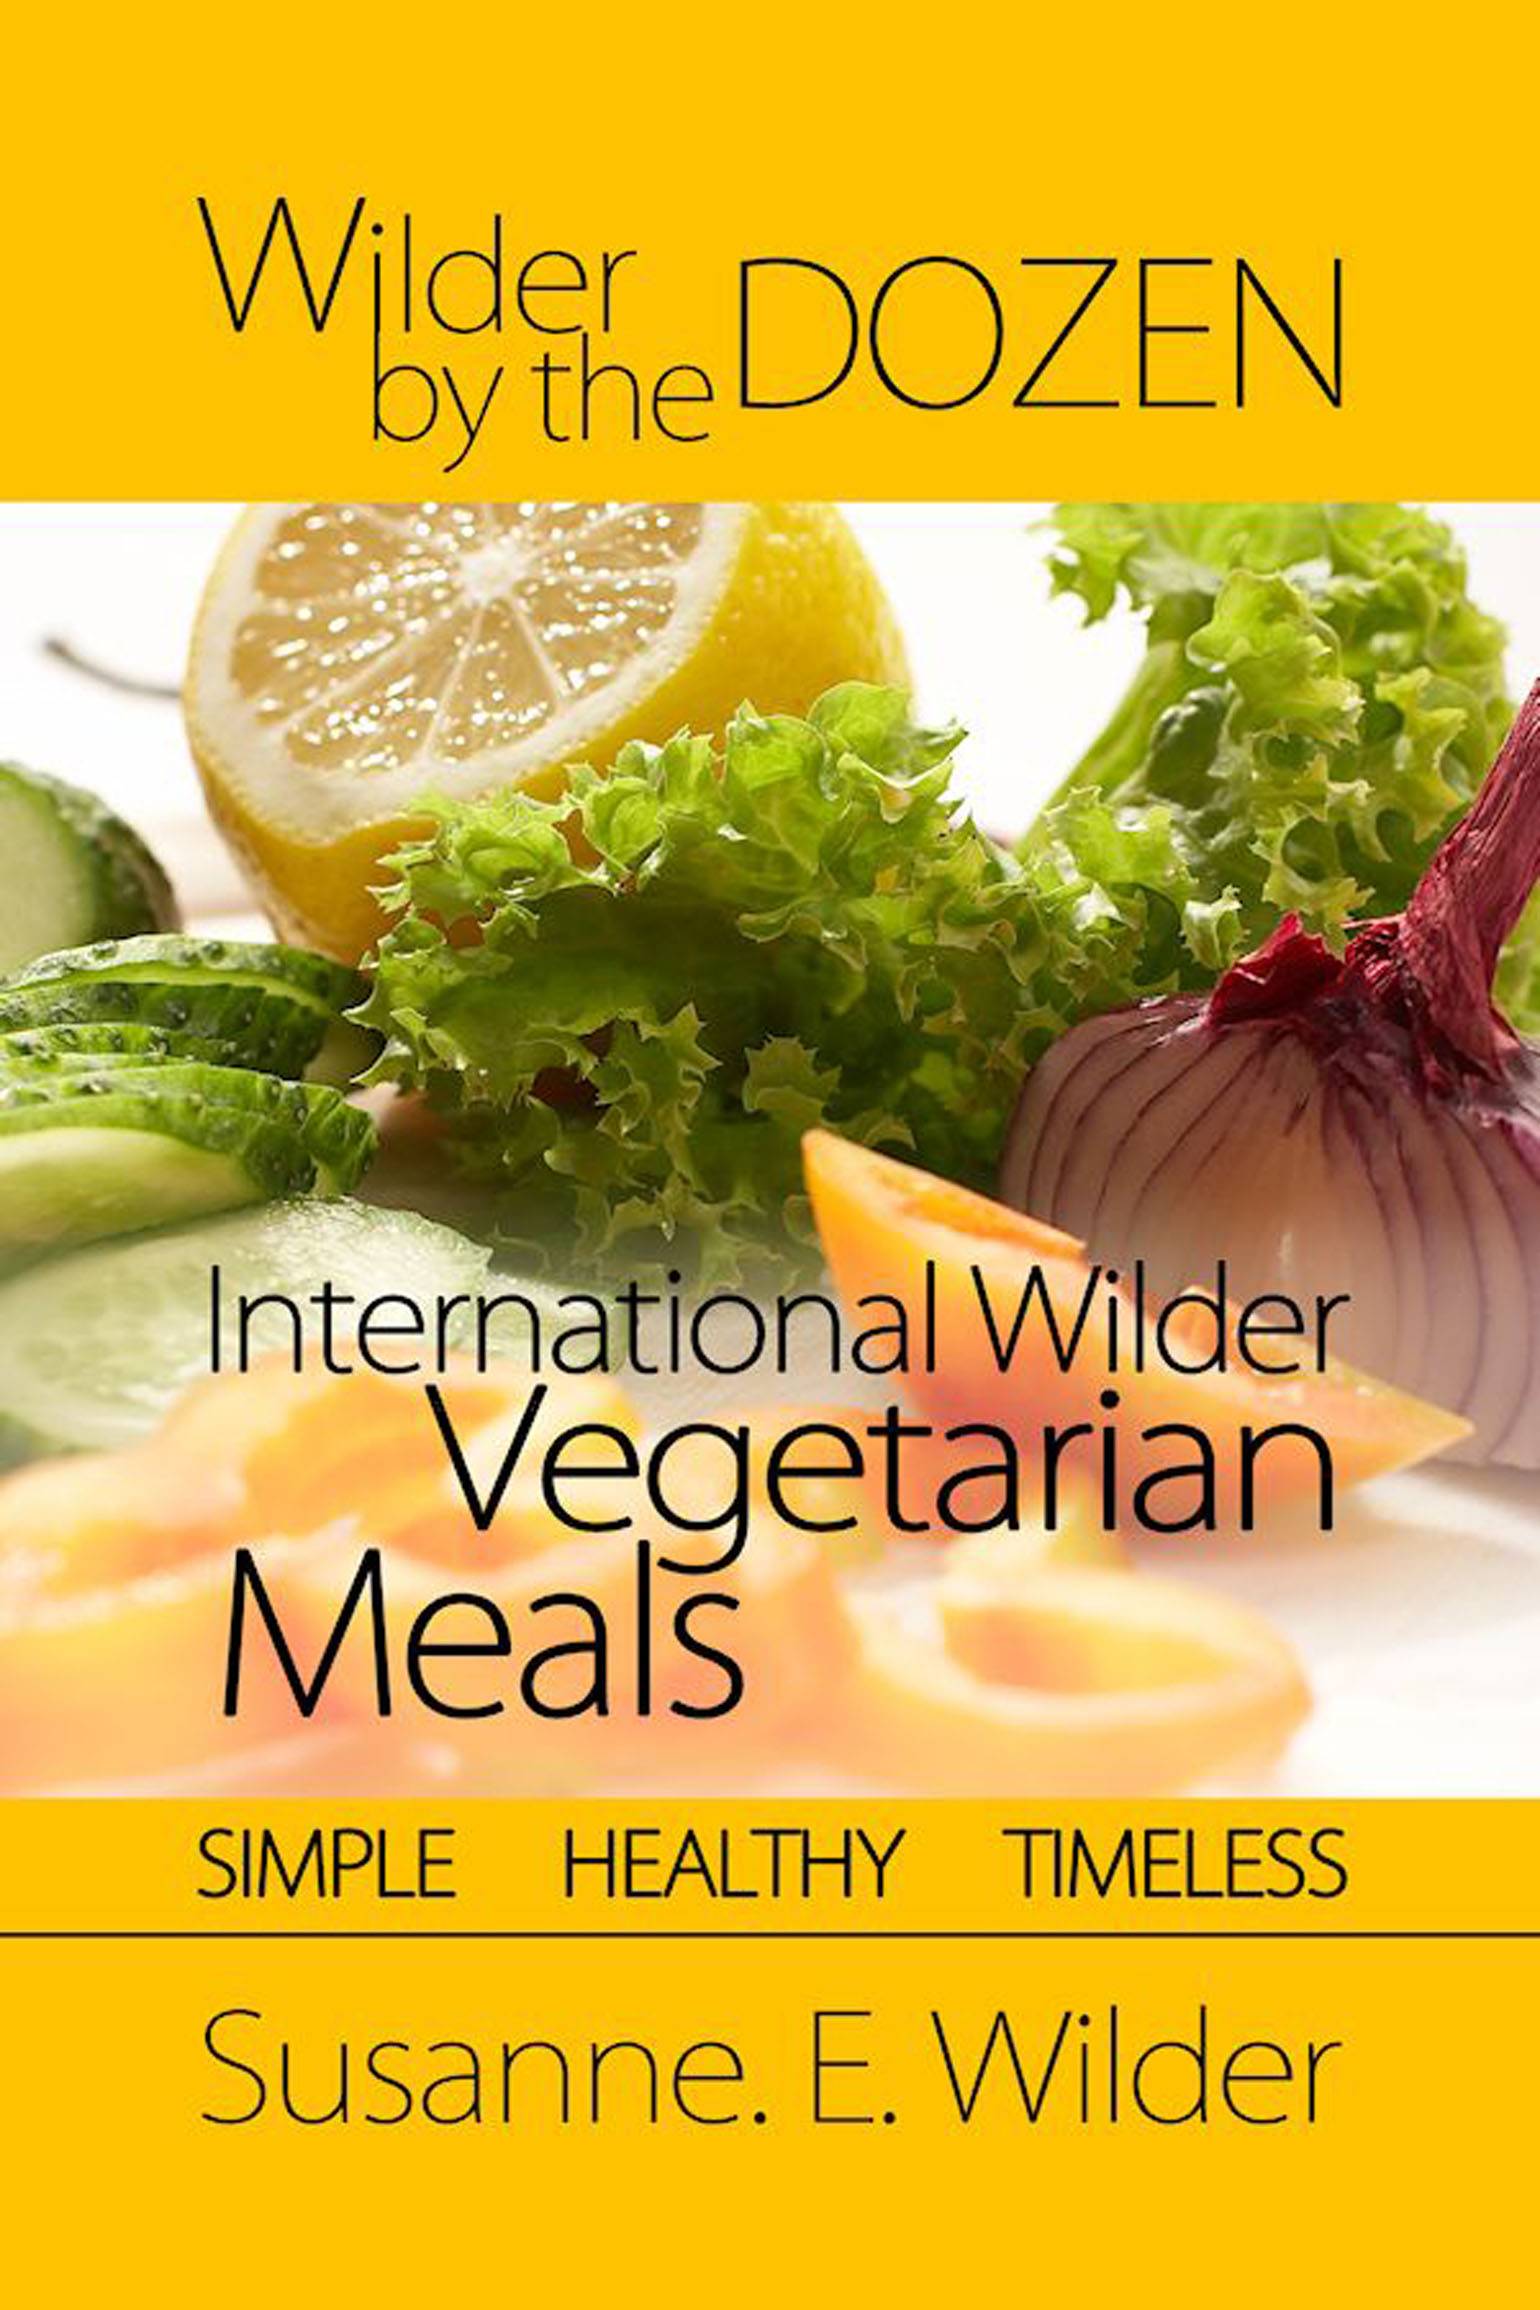 International Wilder Vegetarian Meals